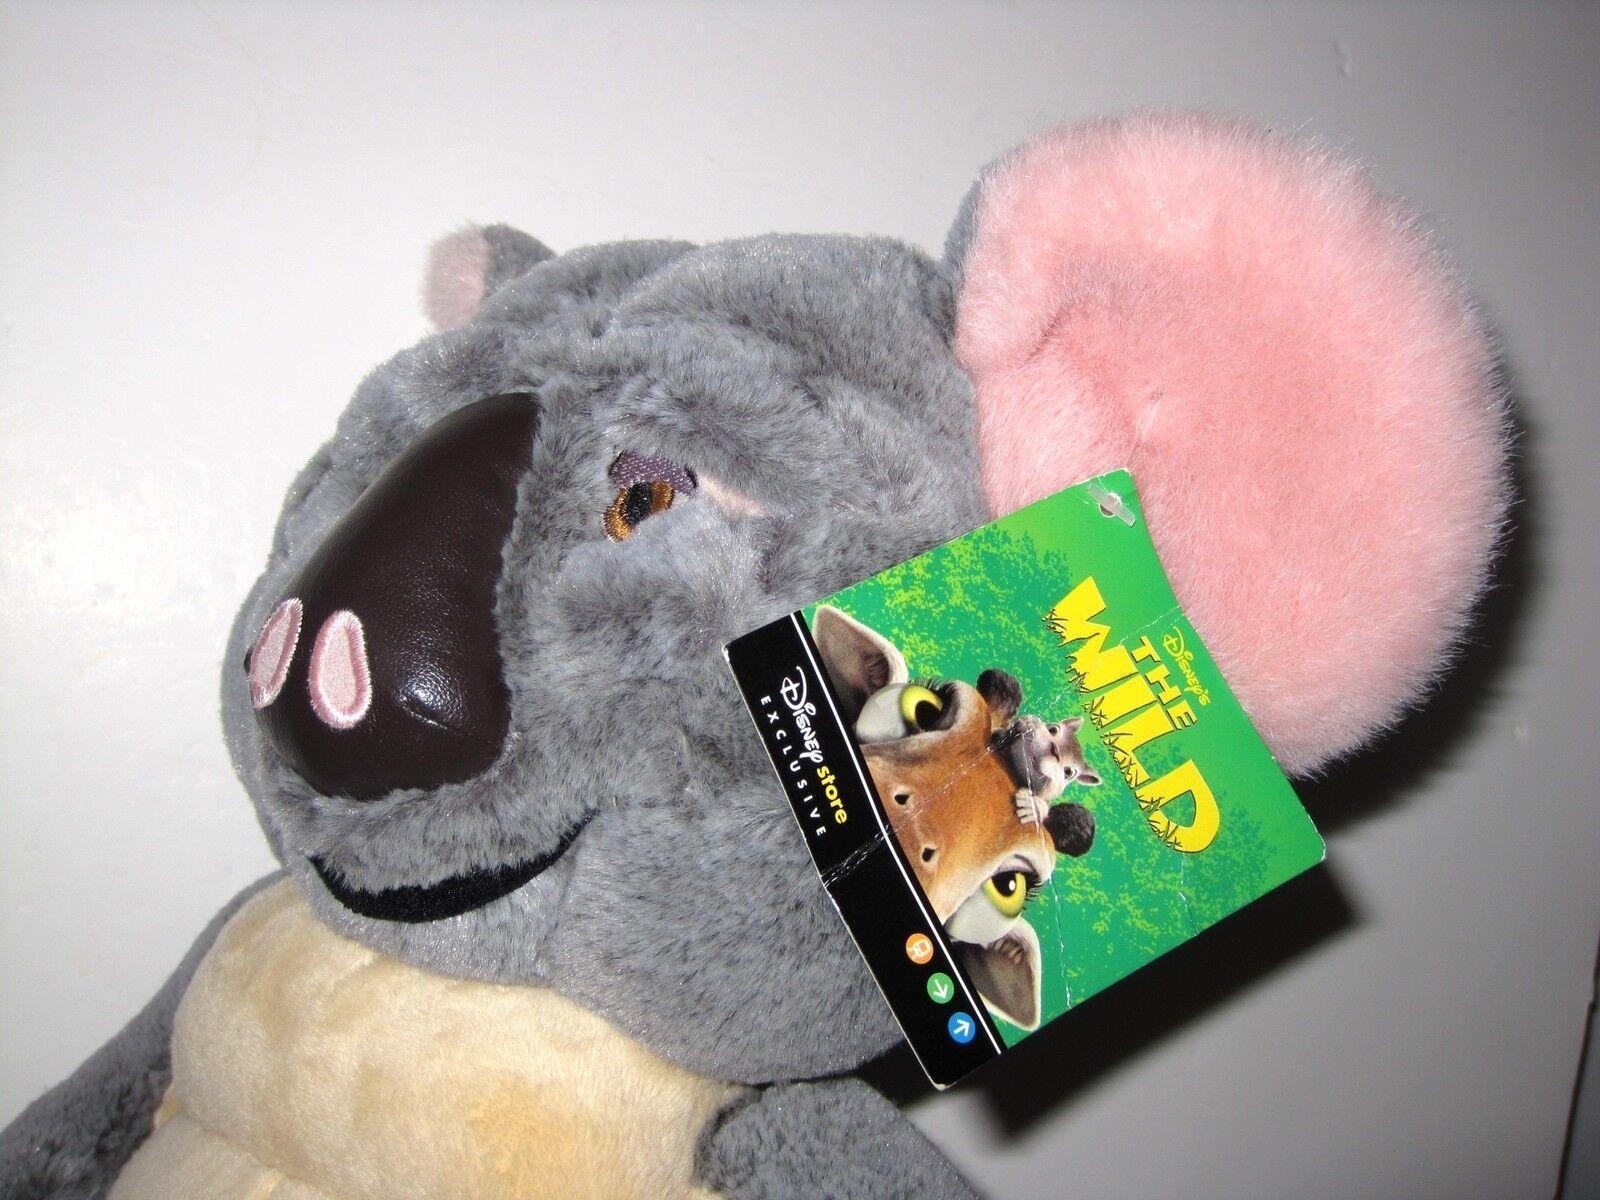 The Wild Toys : Disney store exclusive quot soft toy the wild koala nigel